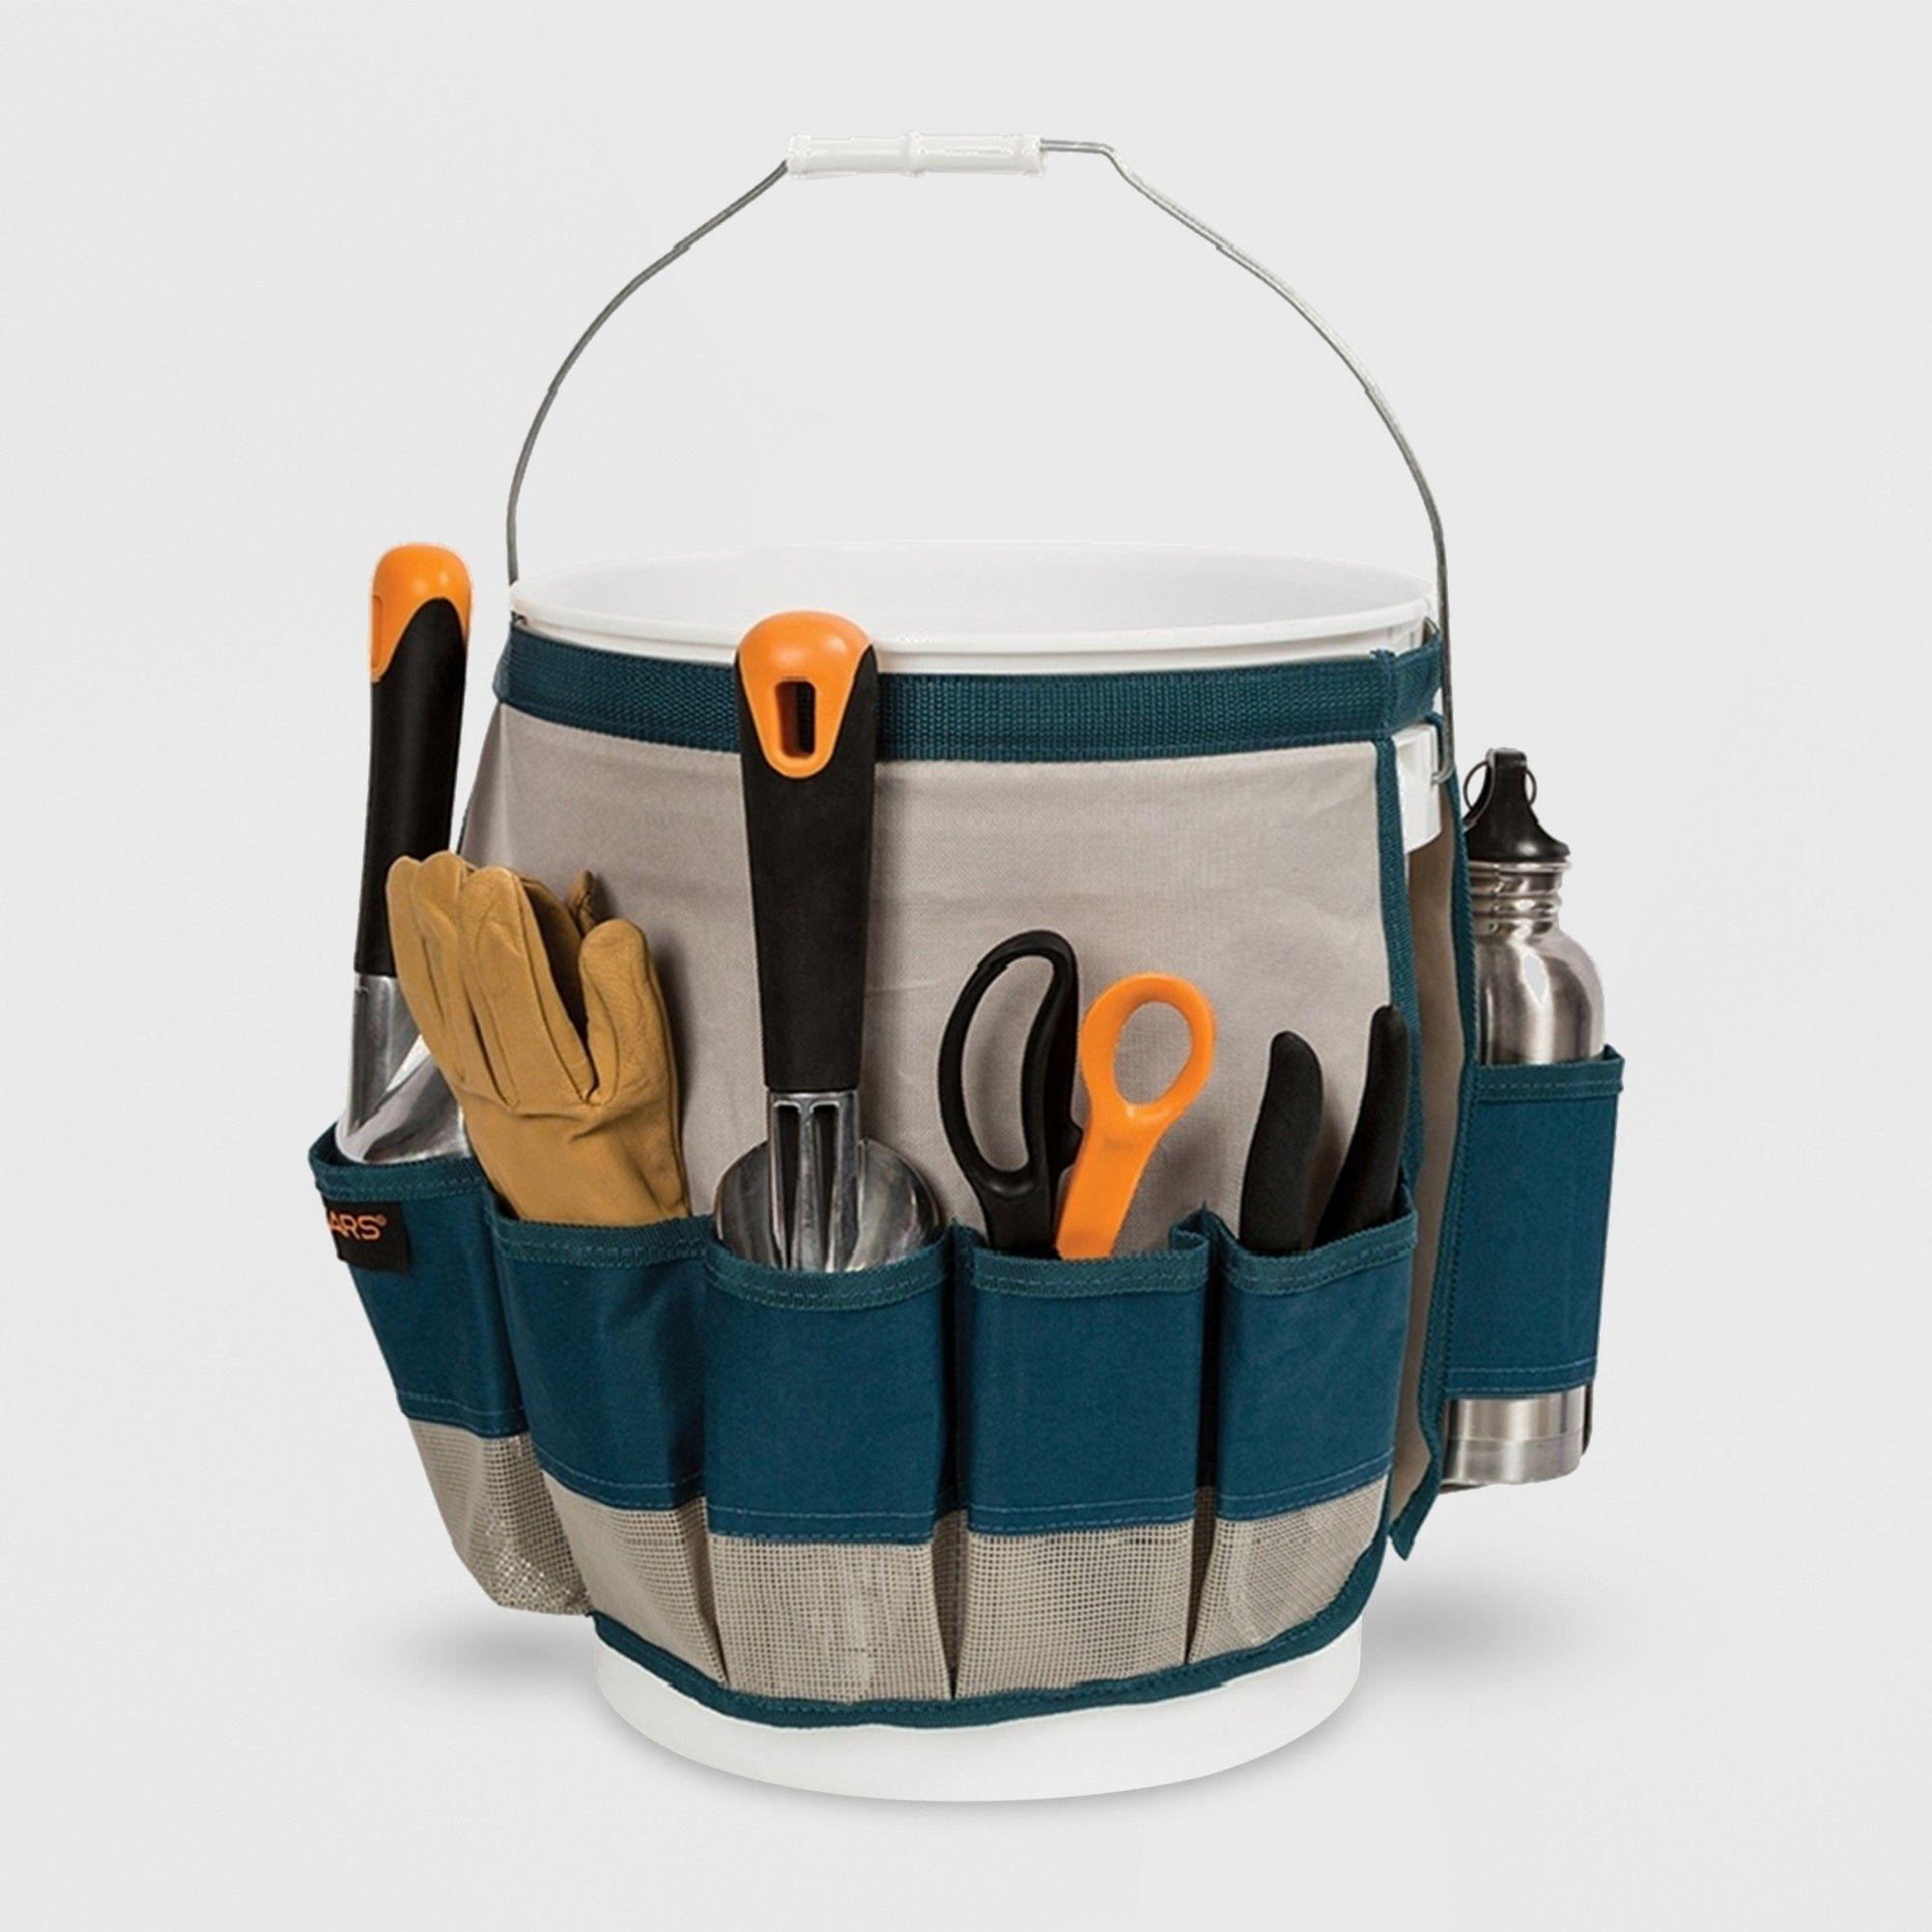 1d955ba57d50f56a2a15d3f3175056ec - Picnic Time Gardener Folding Chair With Tools